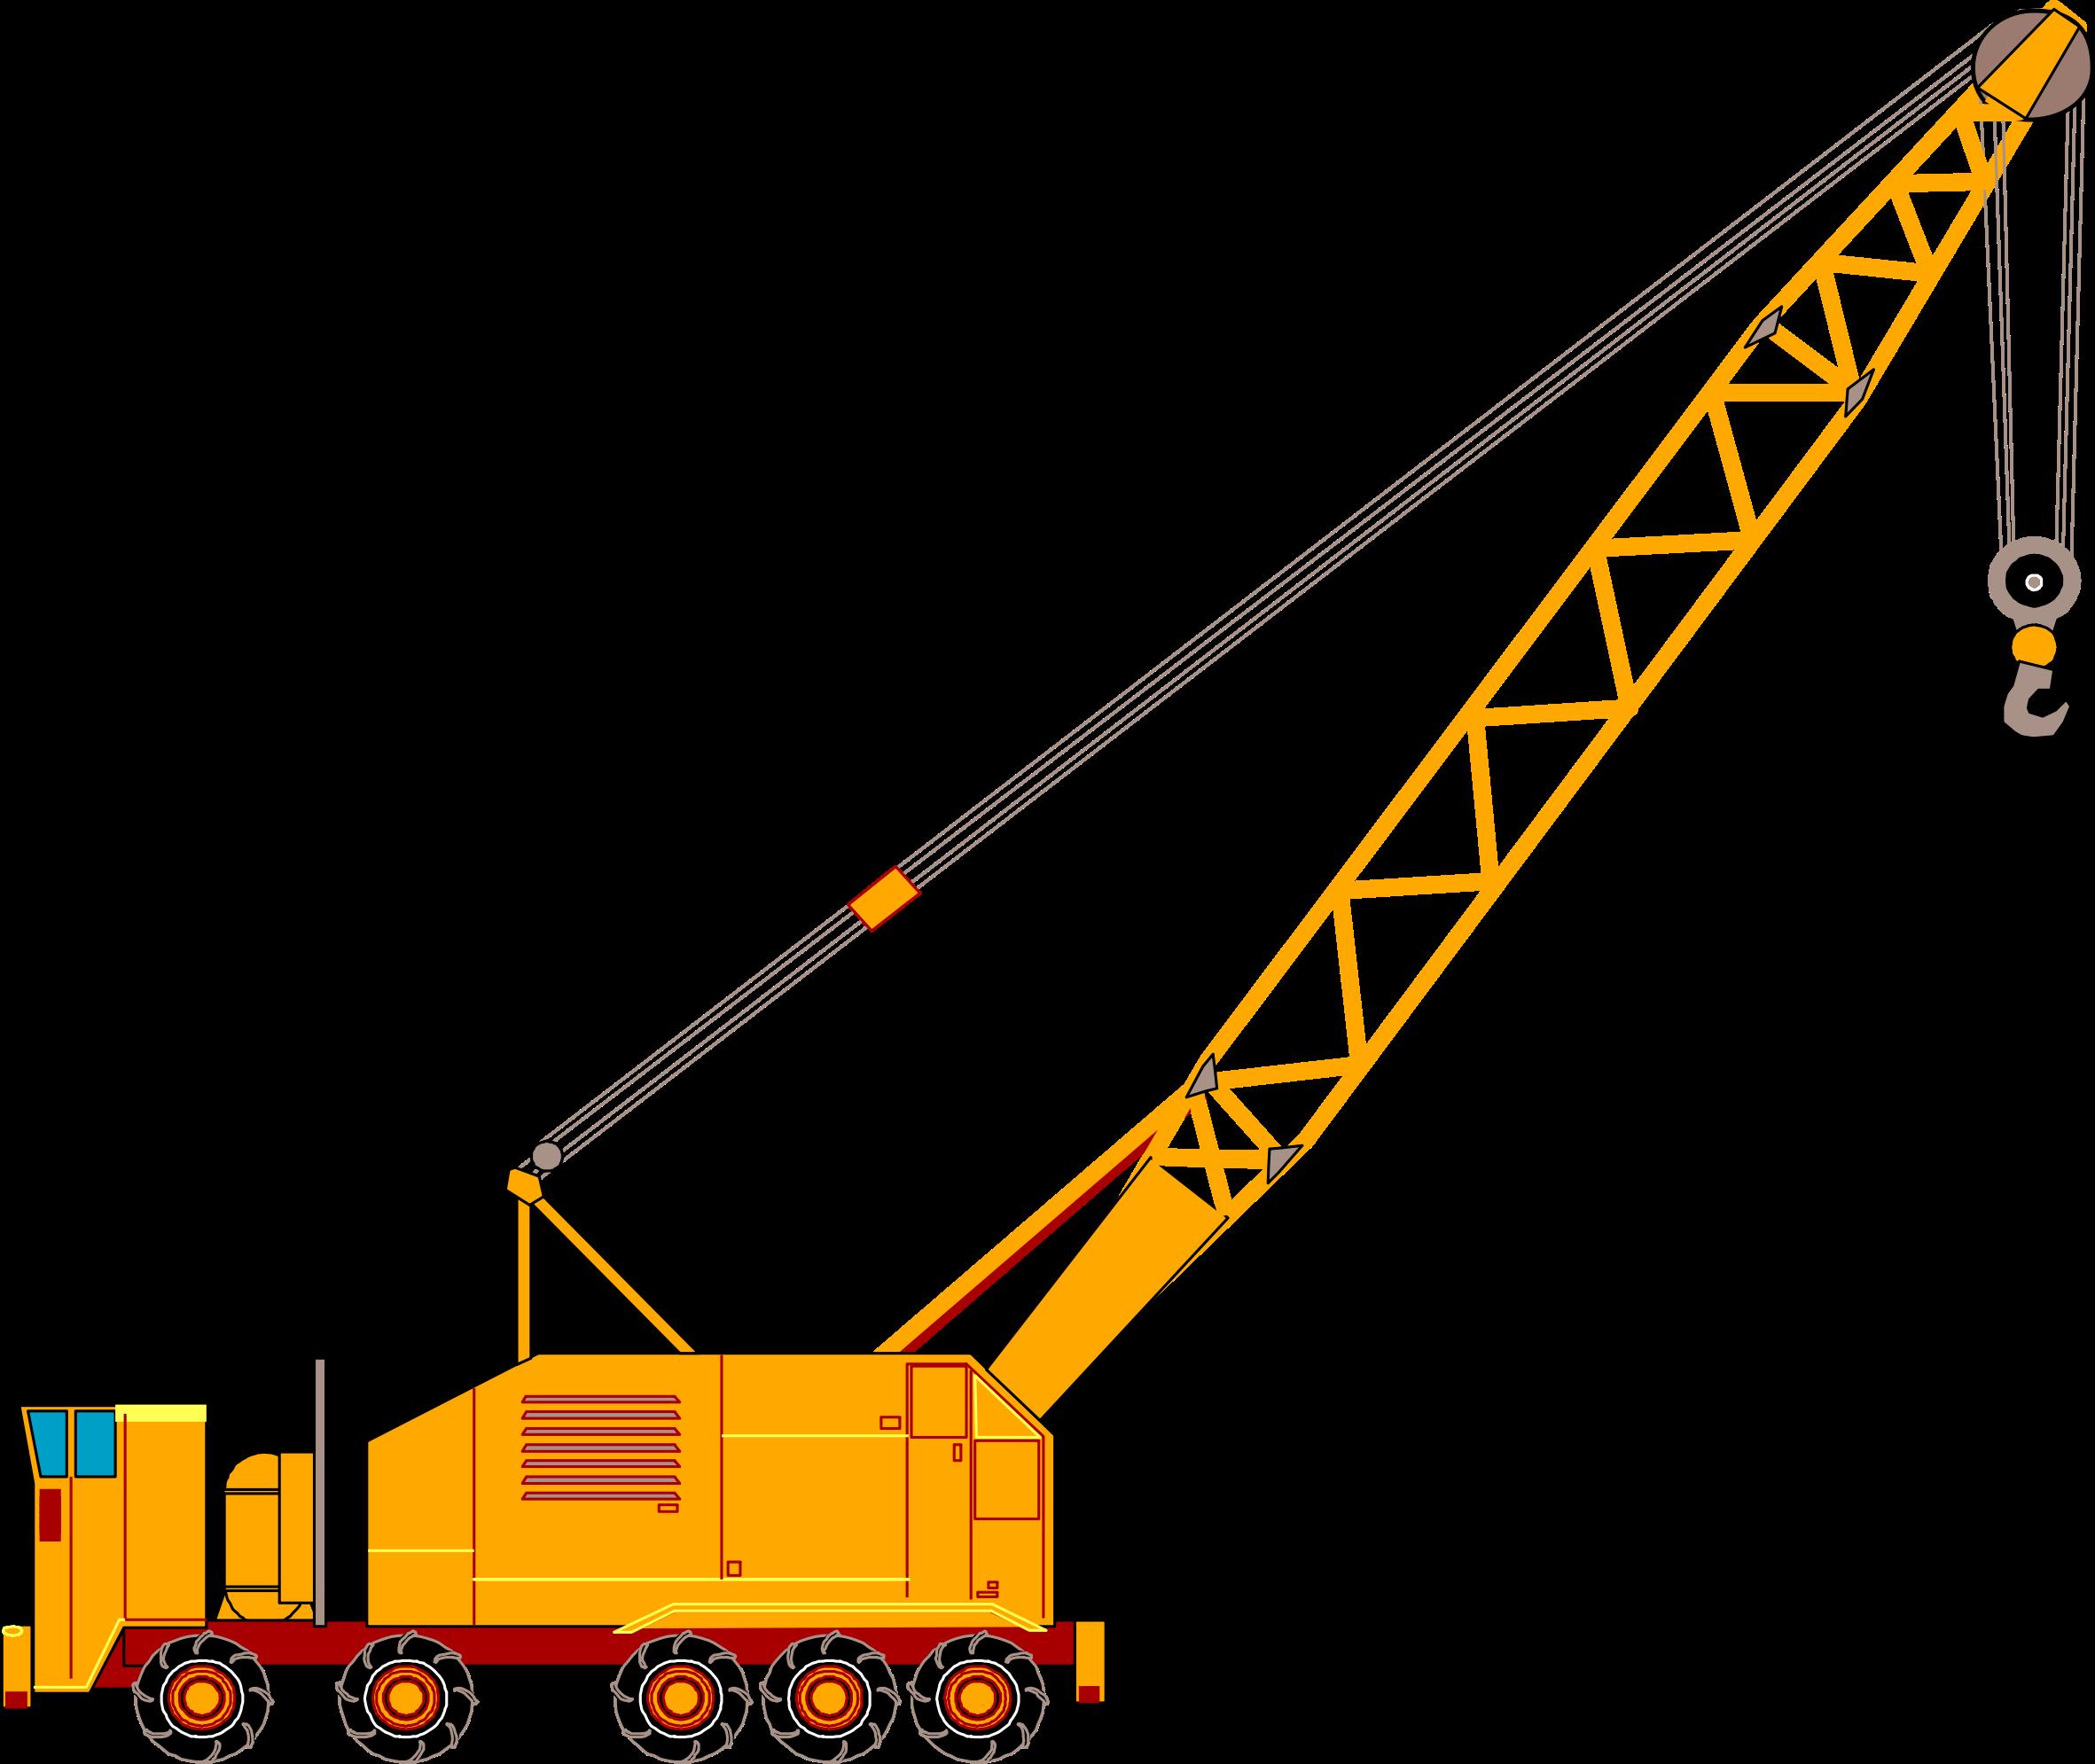 . Crane clipart construction equipment